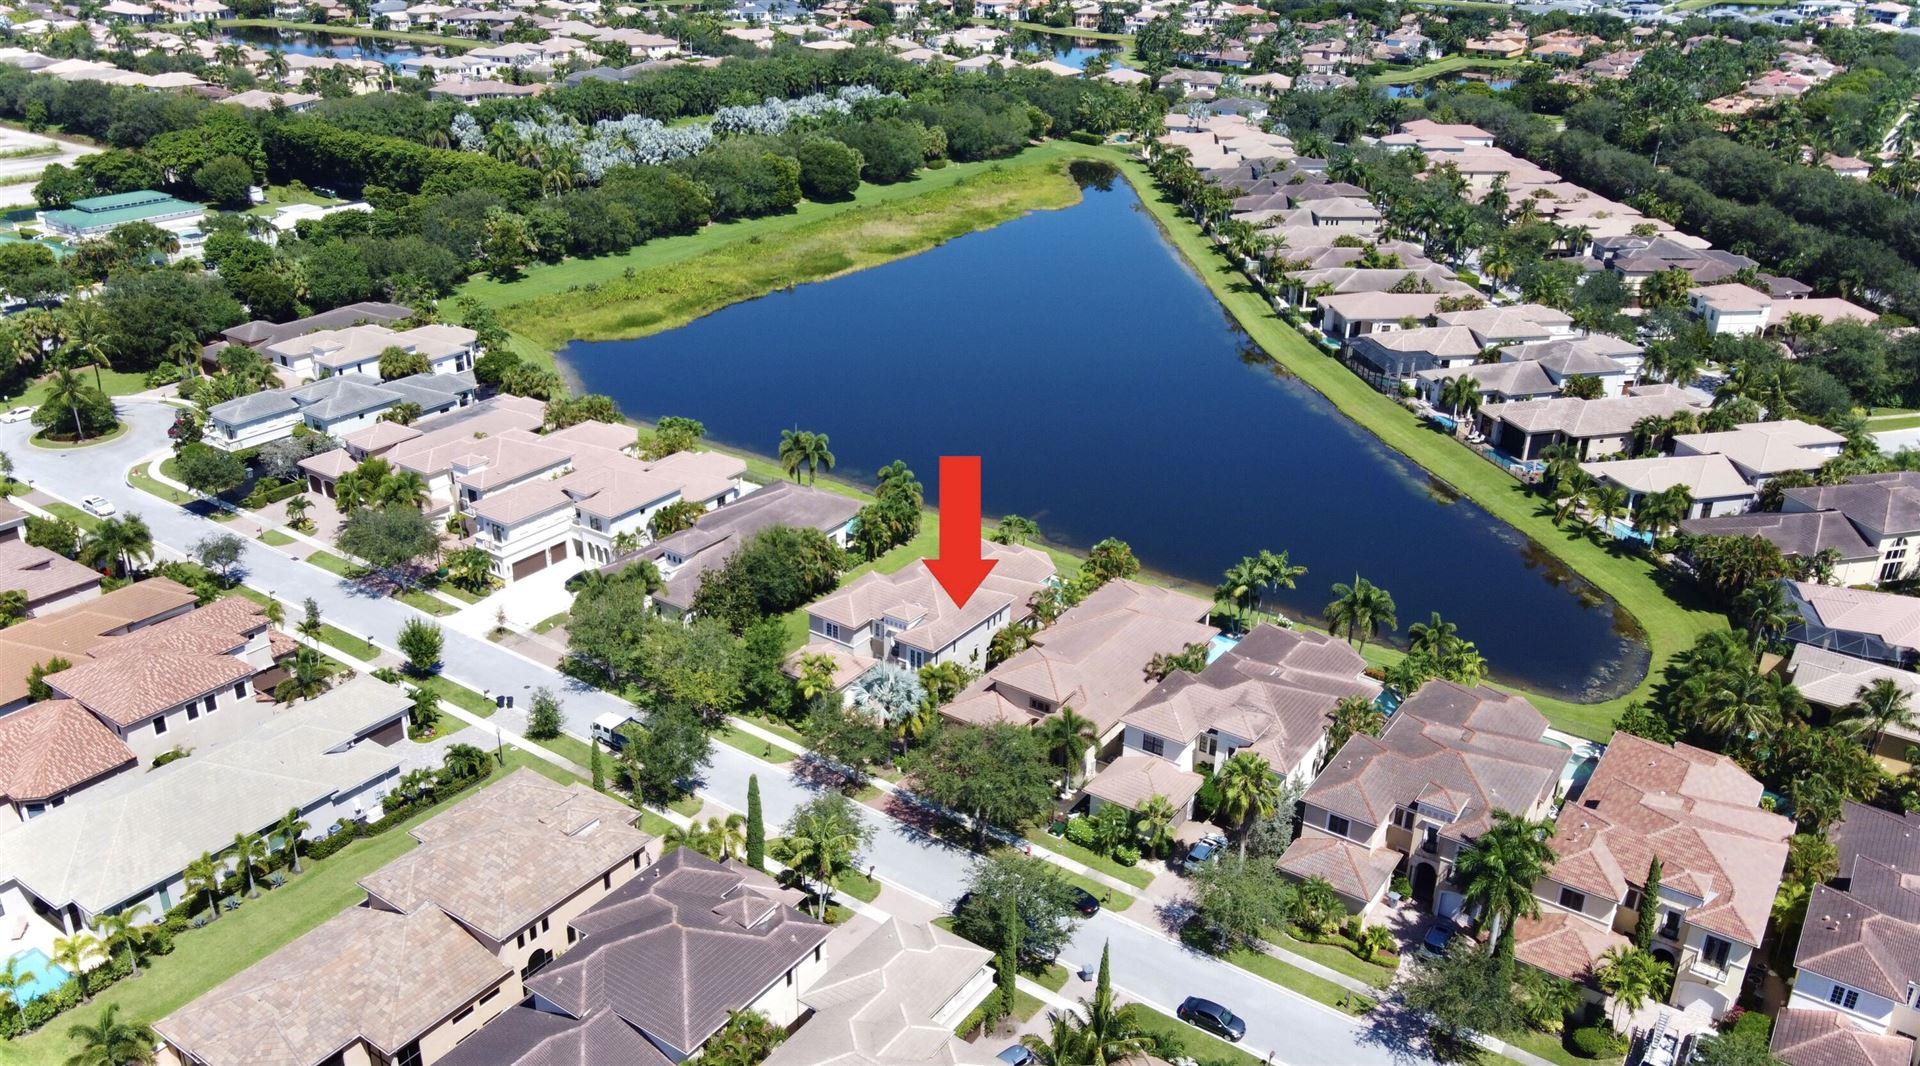 17963 Lake Azure Way, Boca Raton, FL 33496 - MLS#: RX-10754445